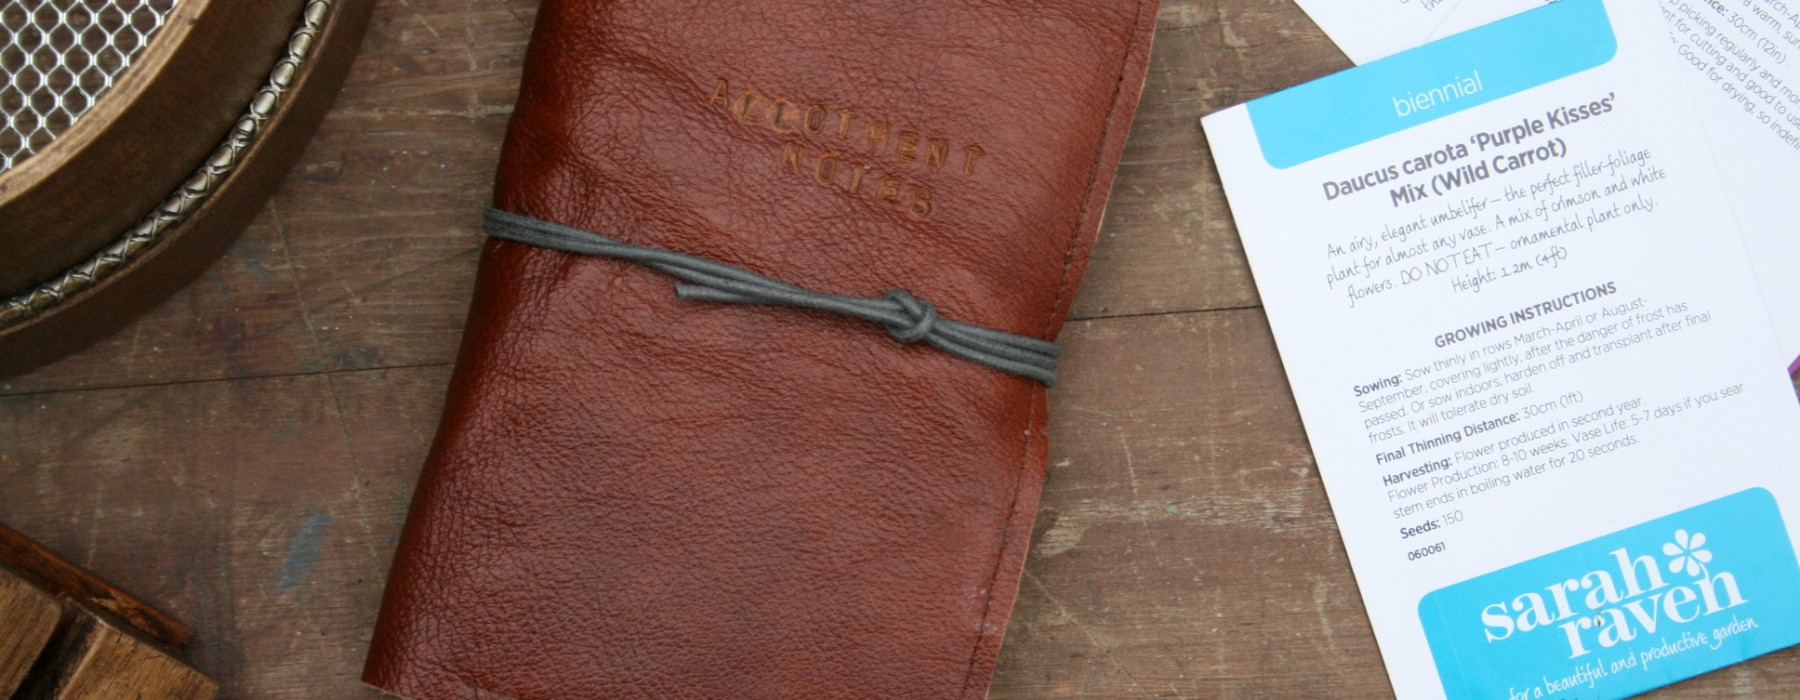 Handmade Journal Give-Away!